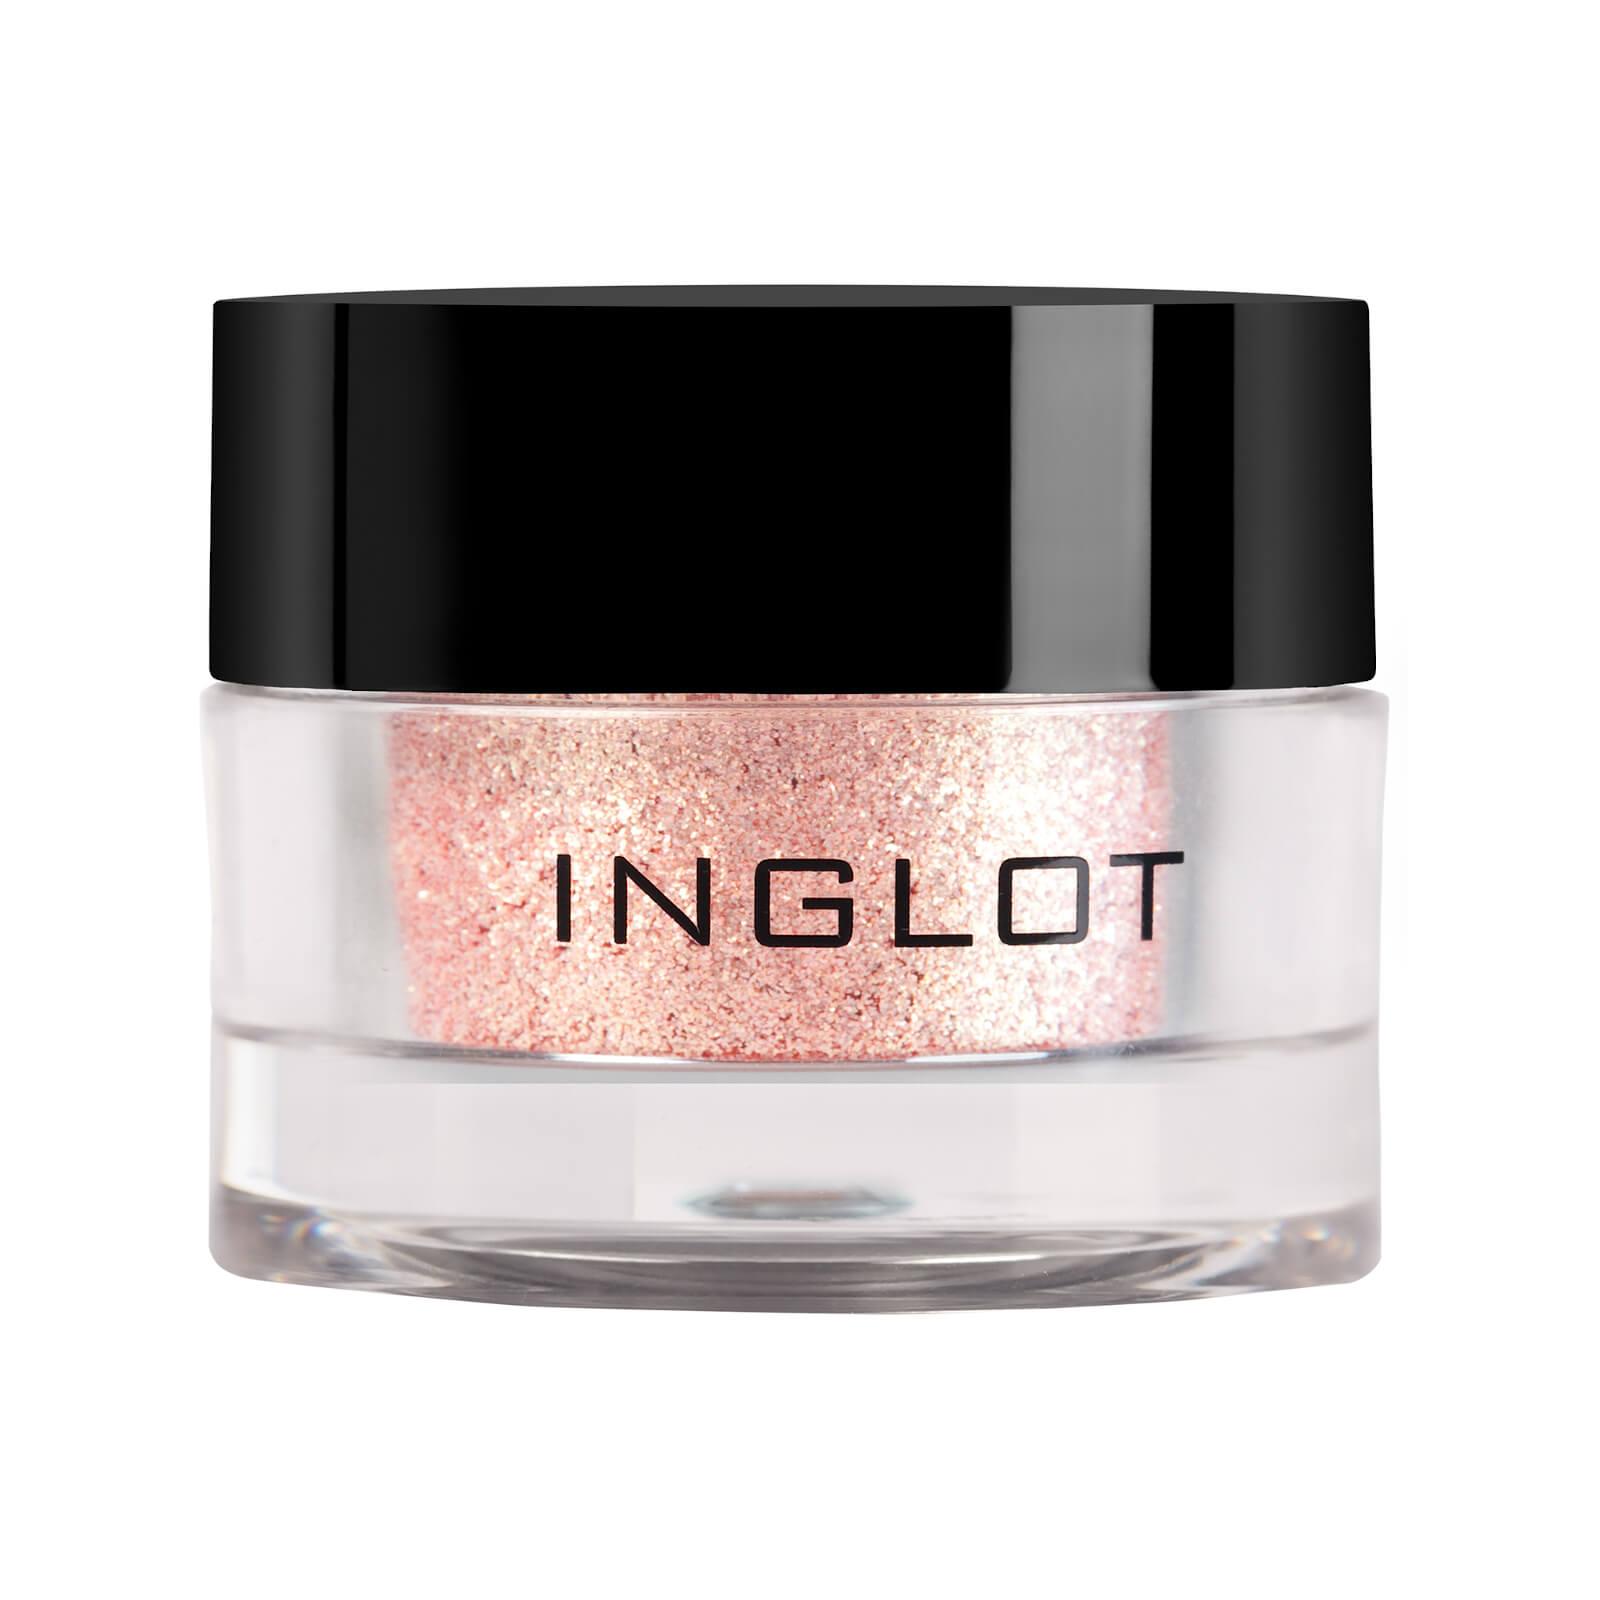 Купить Inglot Amc Pure Pigment Eye Shadow 2g (Various Shades) - 115